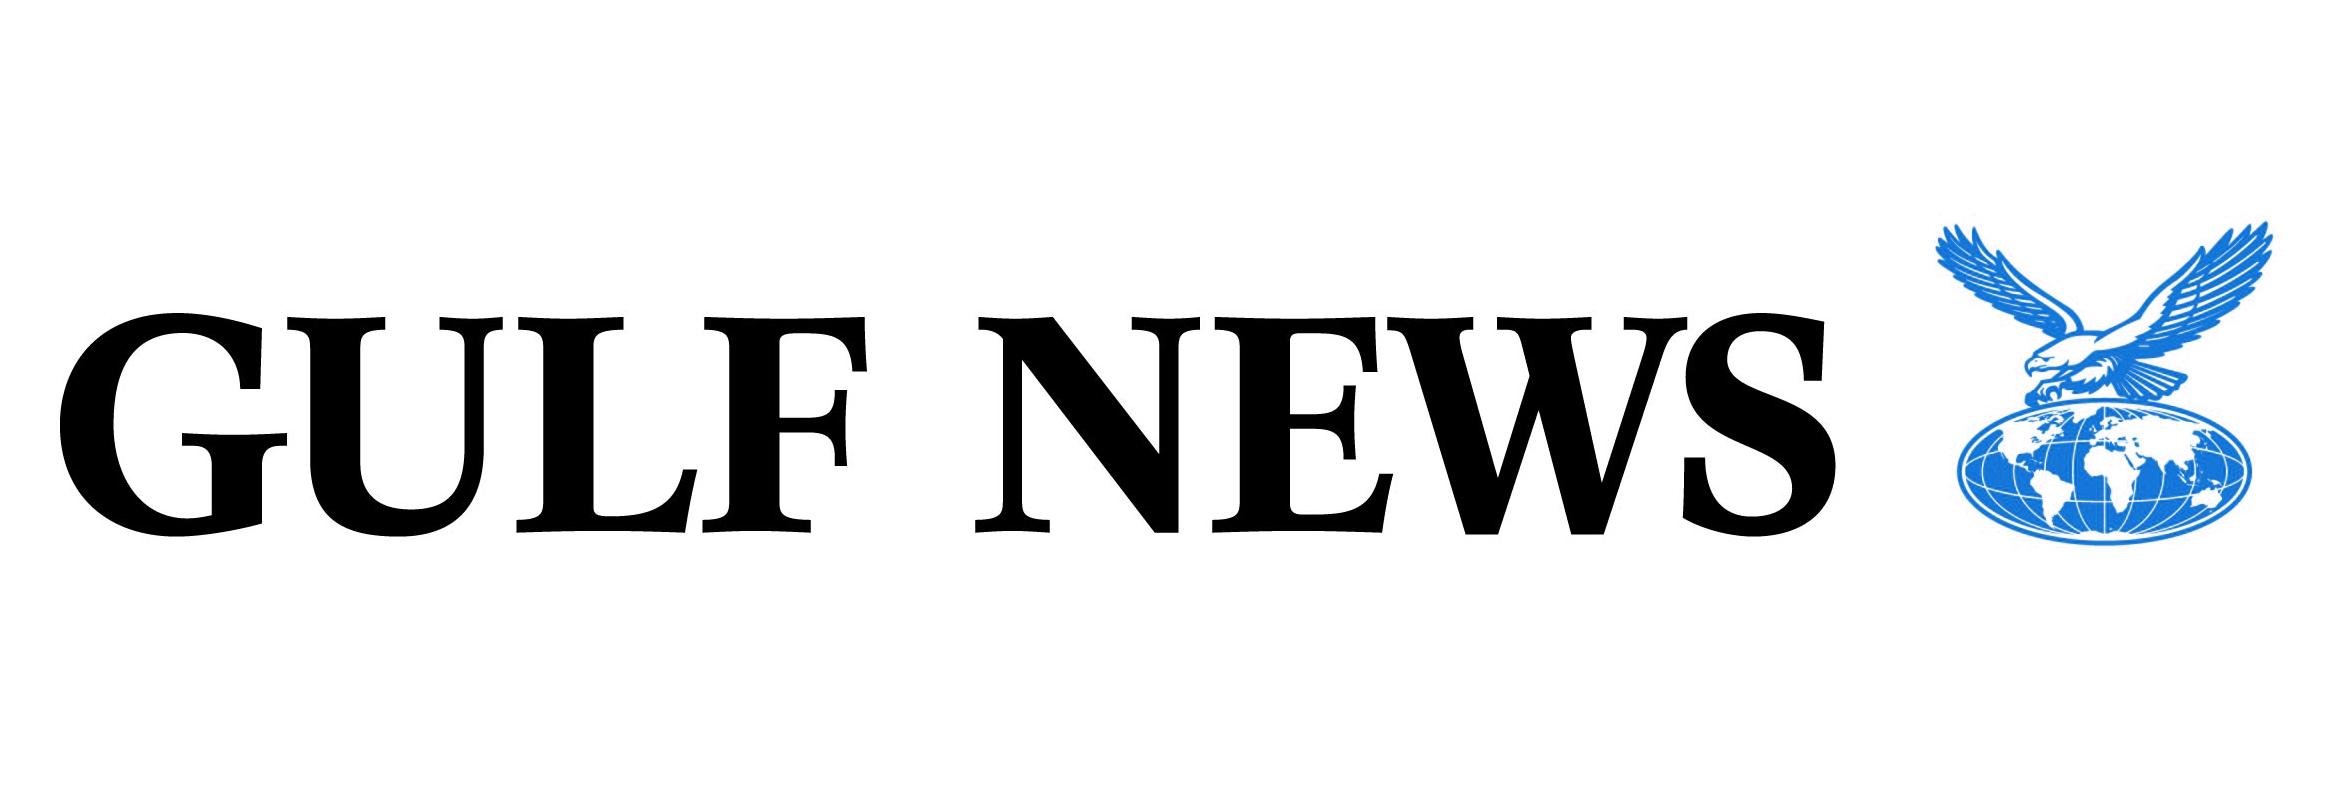 Gulf news Logos